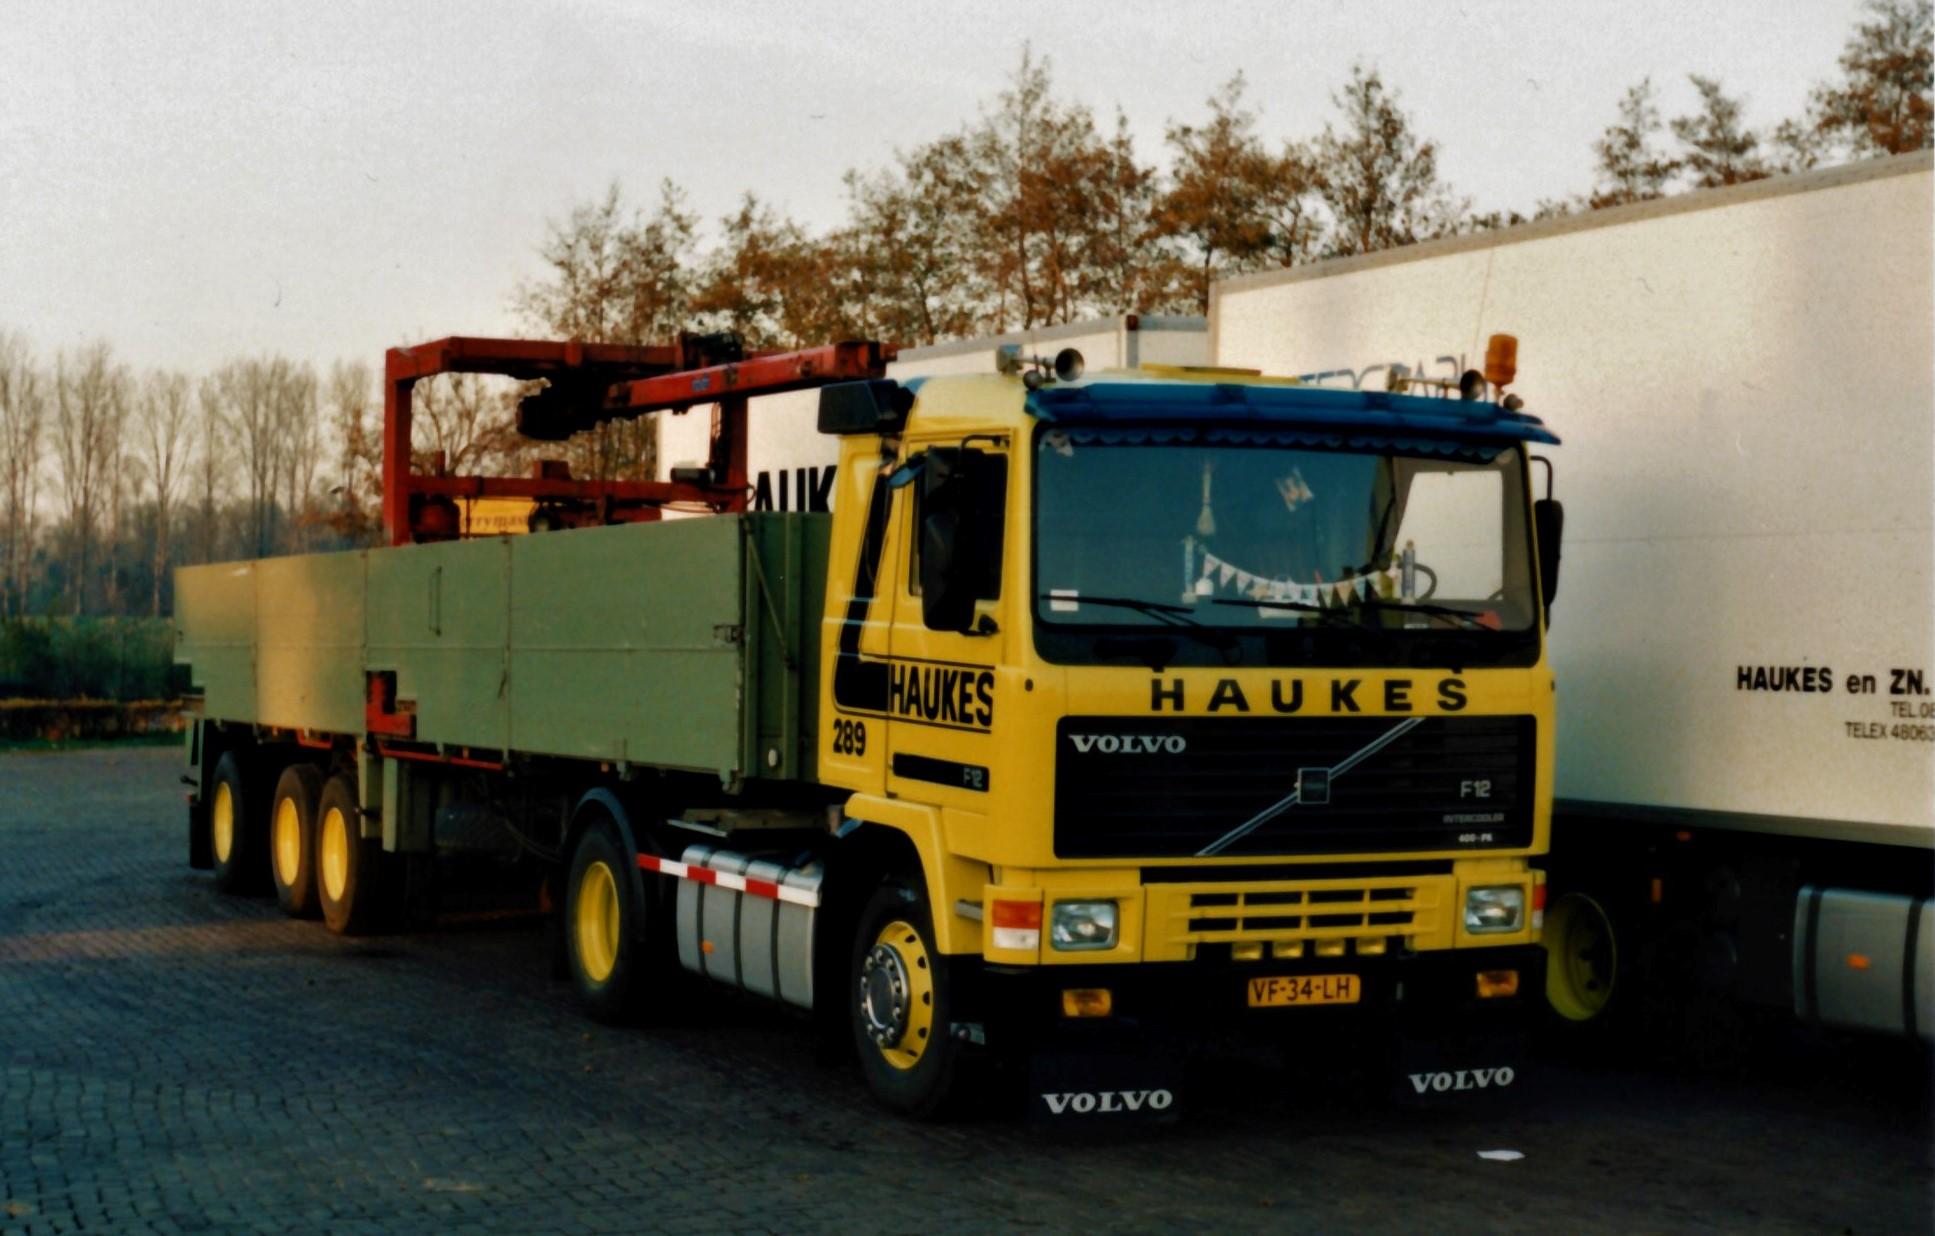 Volvo-289-Han-Megens-met-Floor-steenoplegger-2